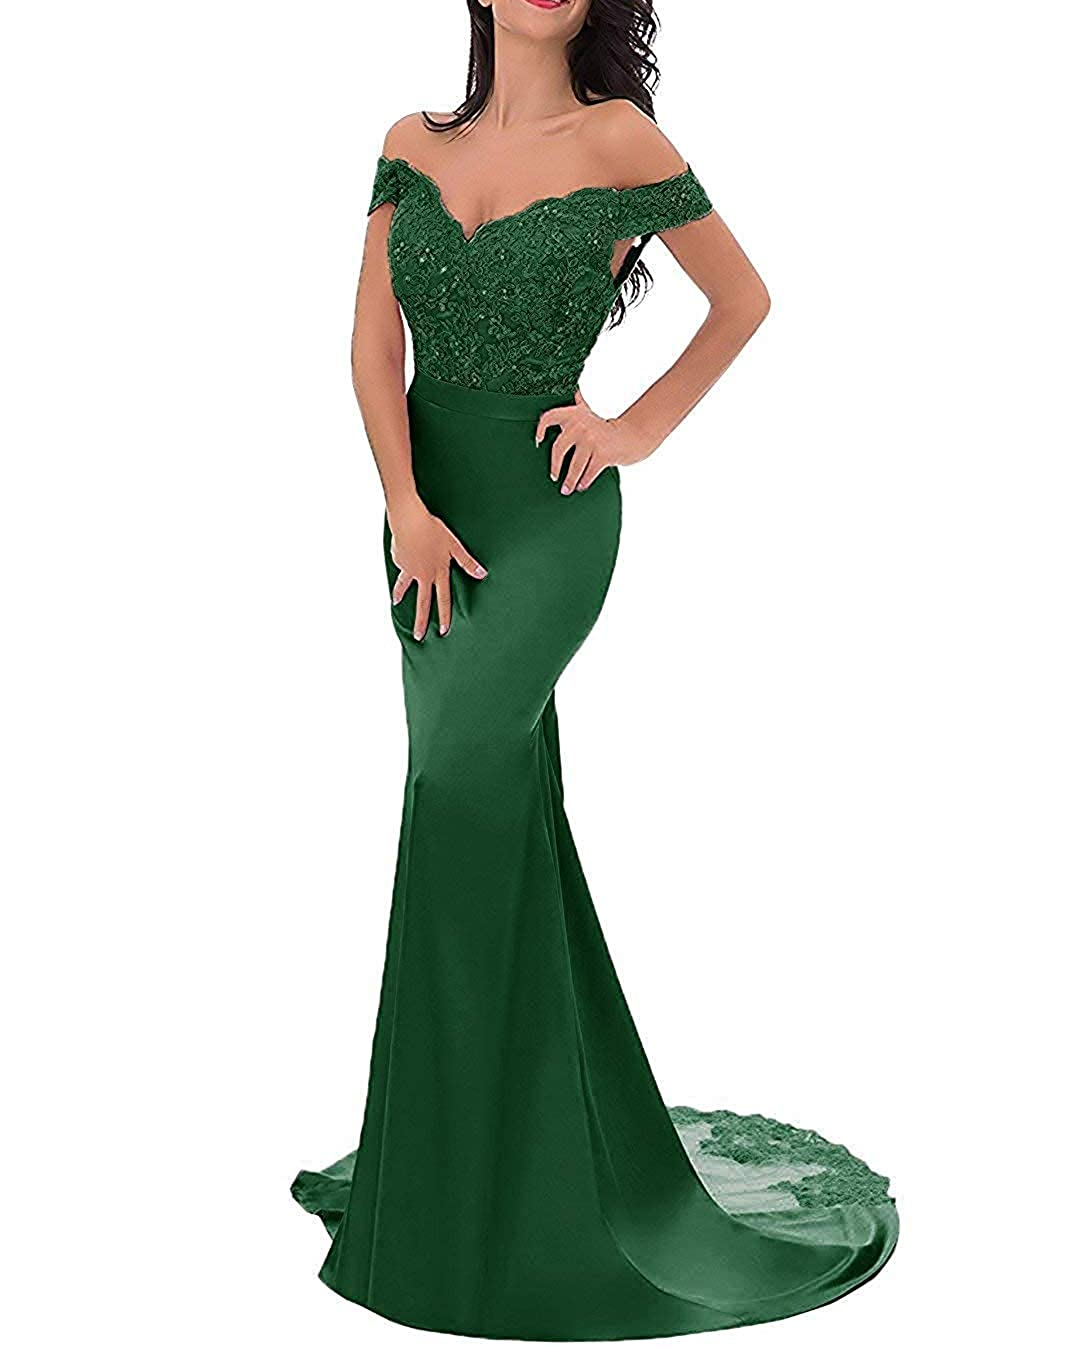 Dark Green PearlBridal VNeck Off Shoulder Mermaid Bridesmaid Dresses Lace Long Evening Formal Gown